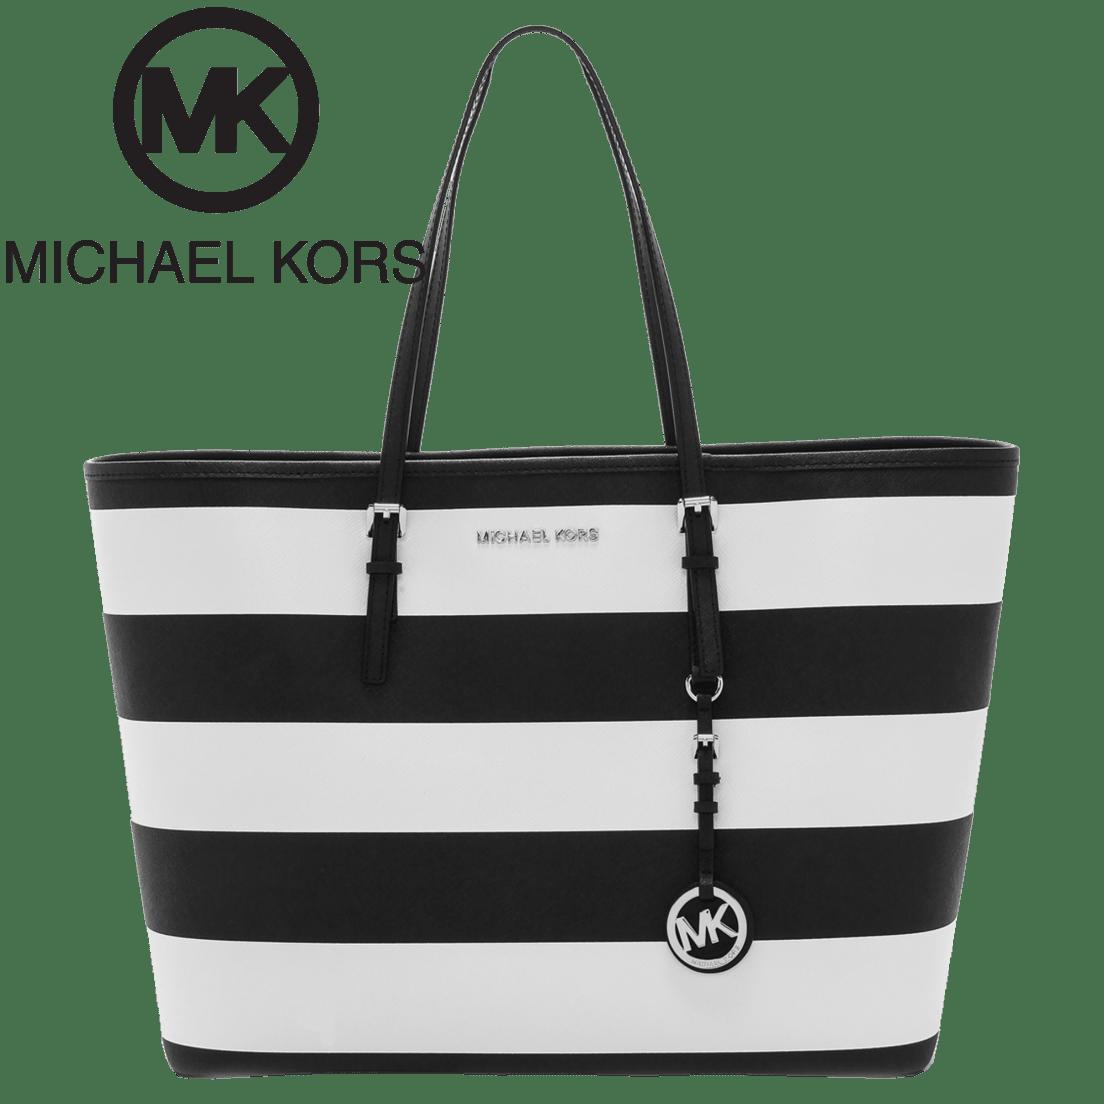 af40c6812d8a Michael Kors Jet Set Medium Saffiano Leather Top-Zip Tote in Black   White